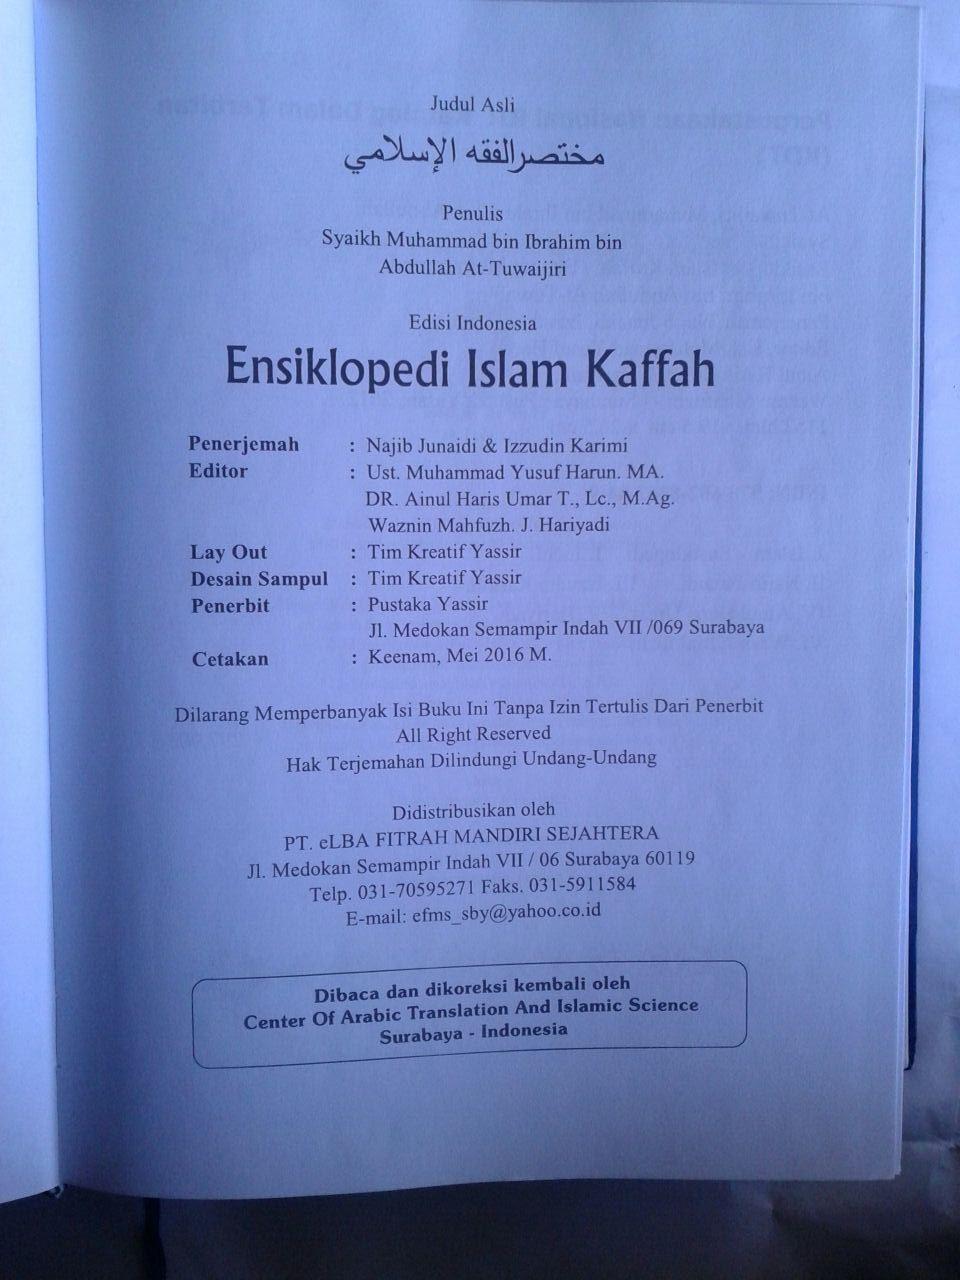 Buku Ensiklopedi Islam Kaffah Edisi Terlengkap isi